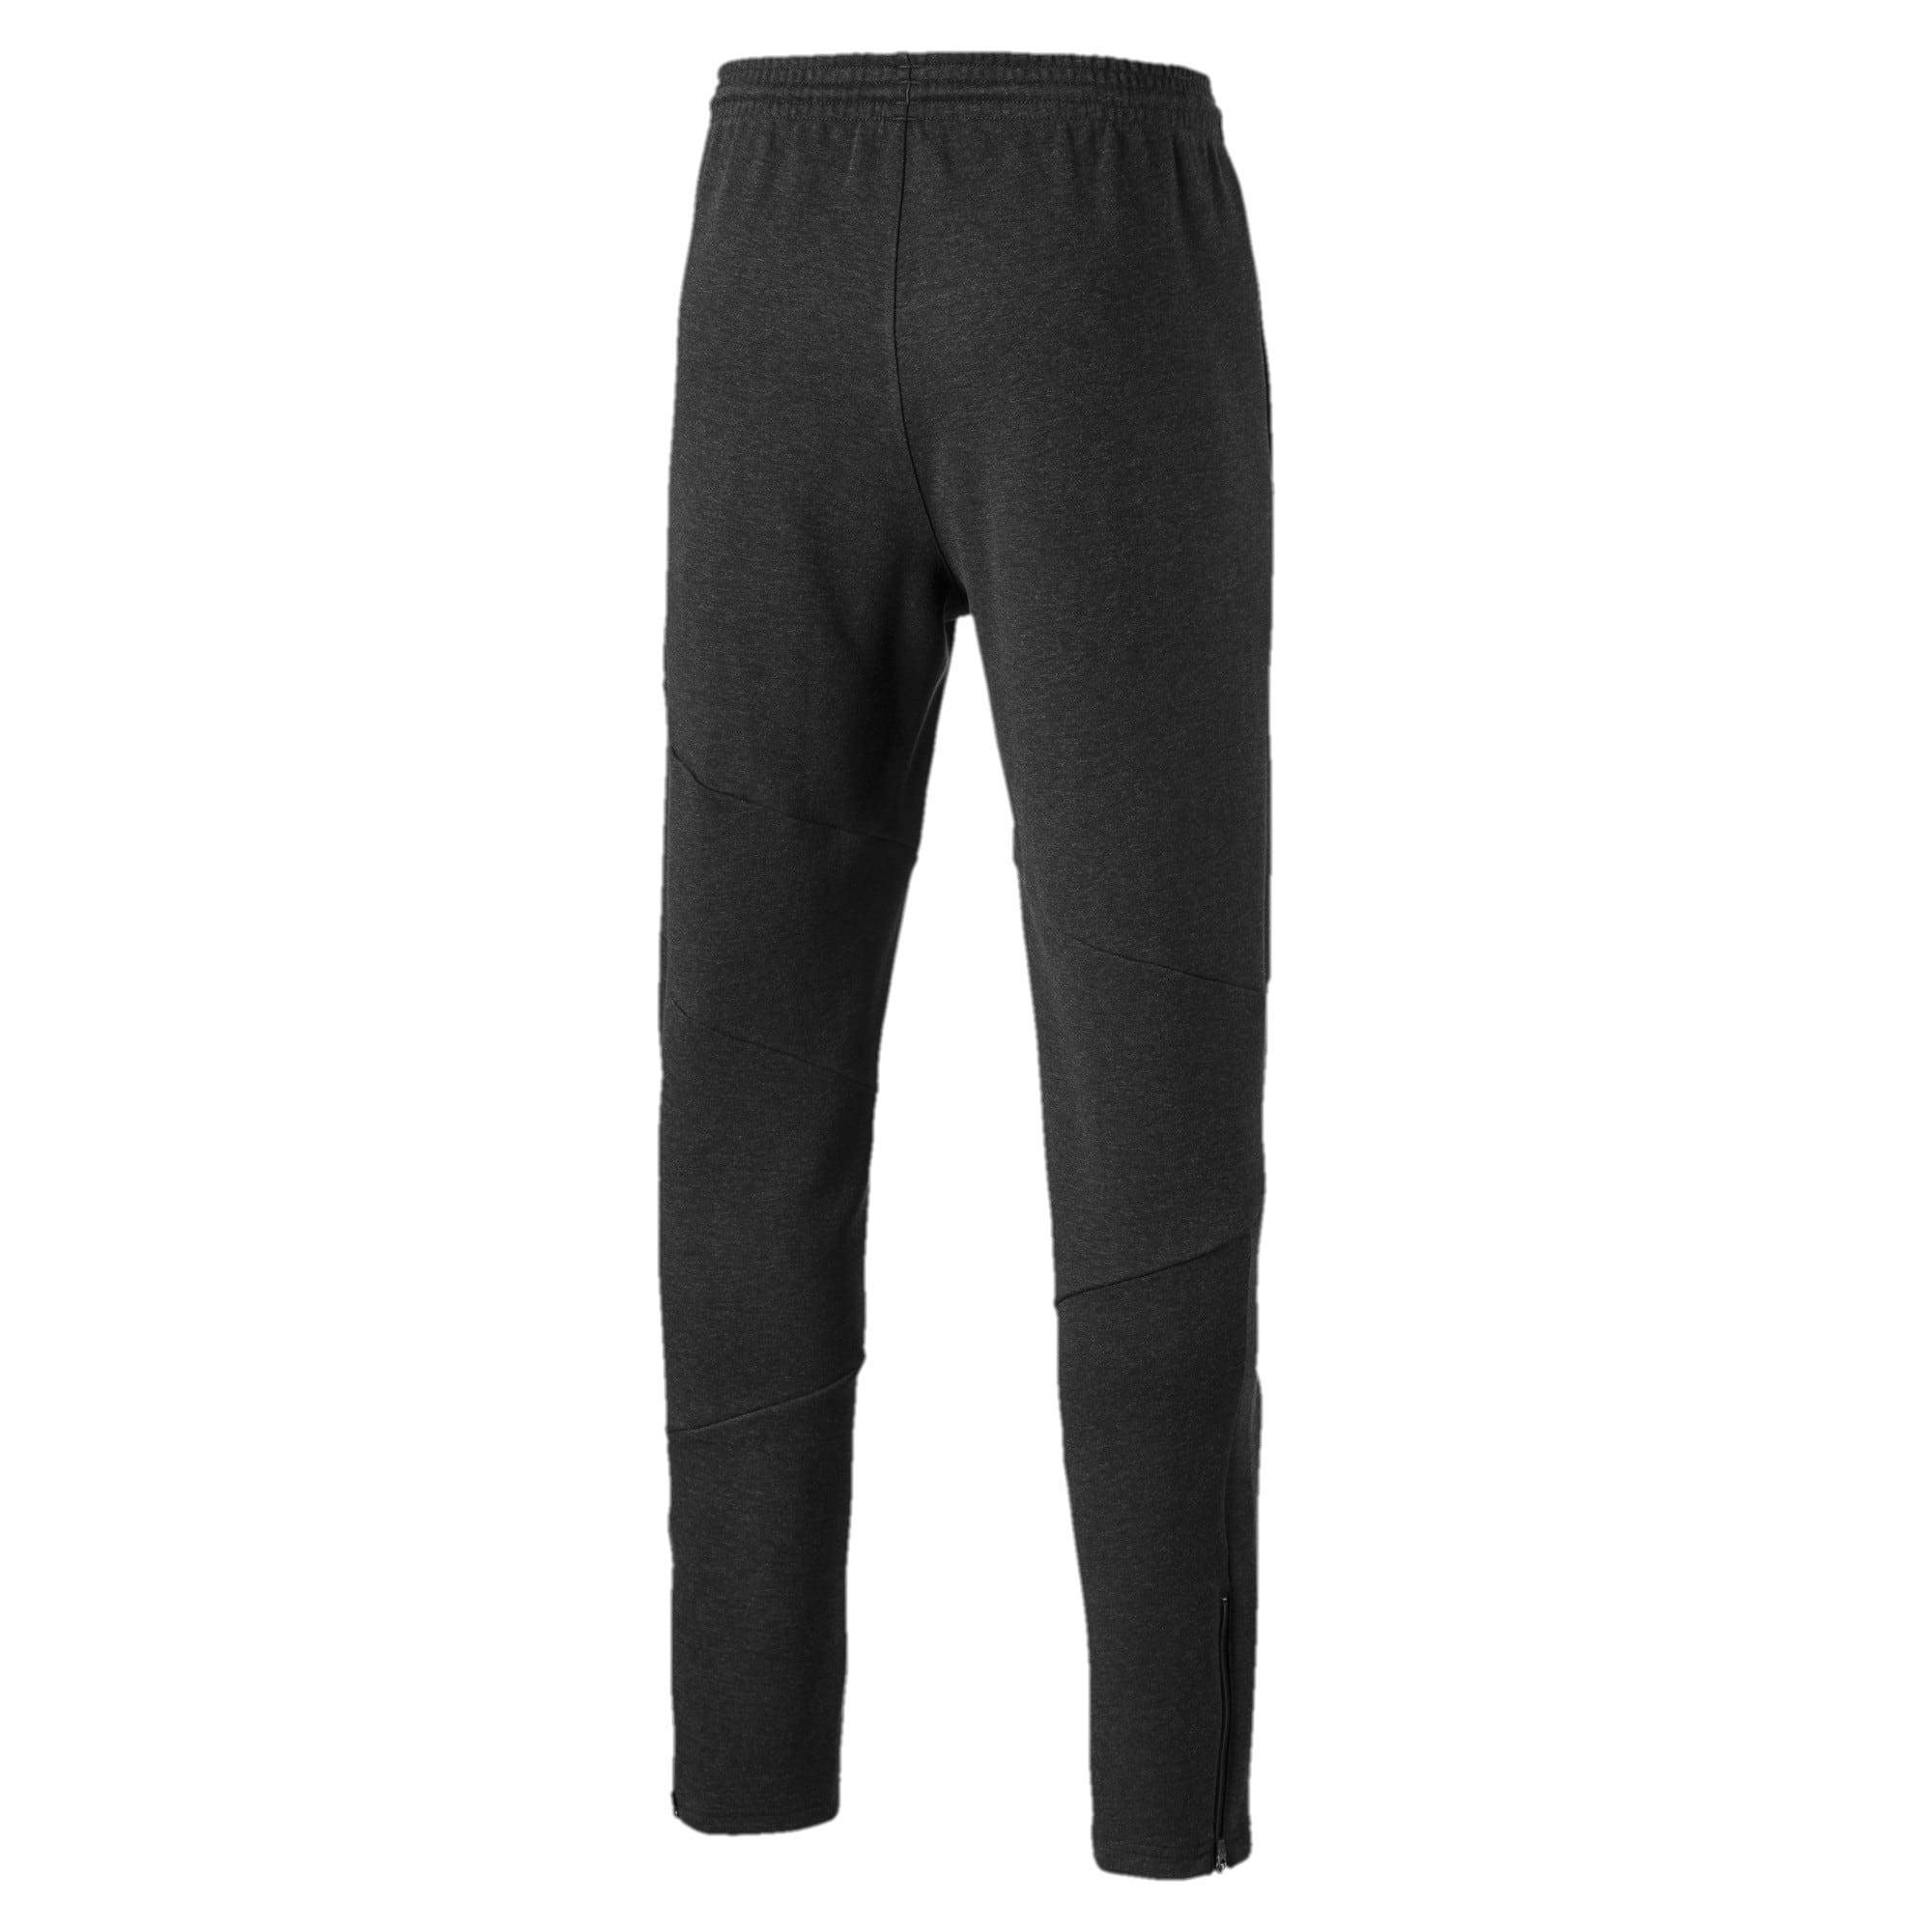 Thumbnail 5 of BND Tech Knitted Men's Training Pants, Puma Black Heather, medium-IND